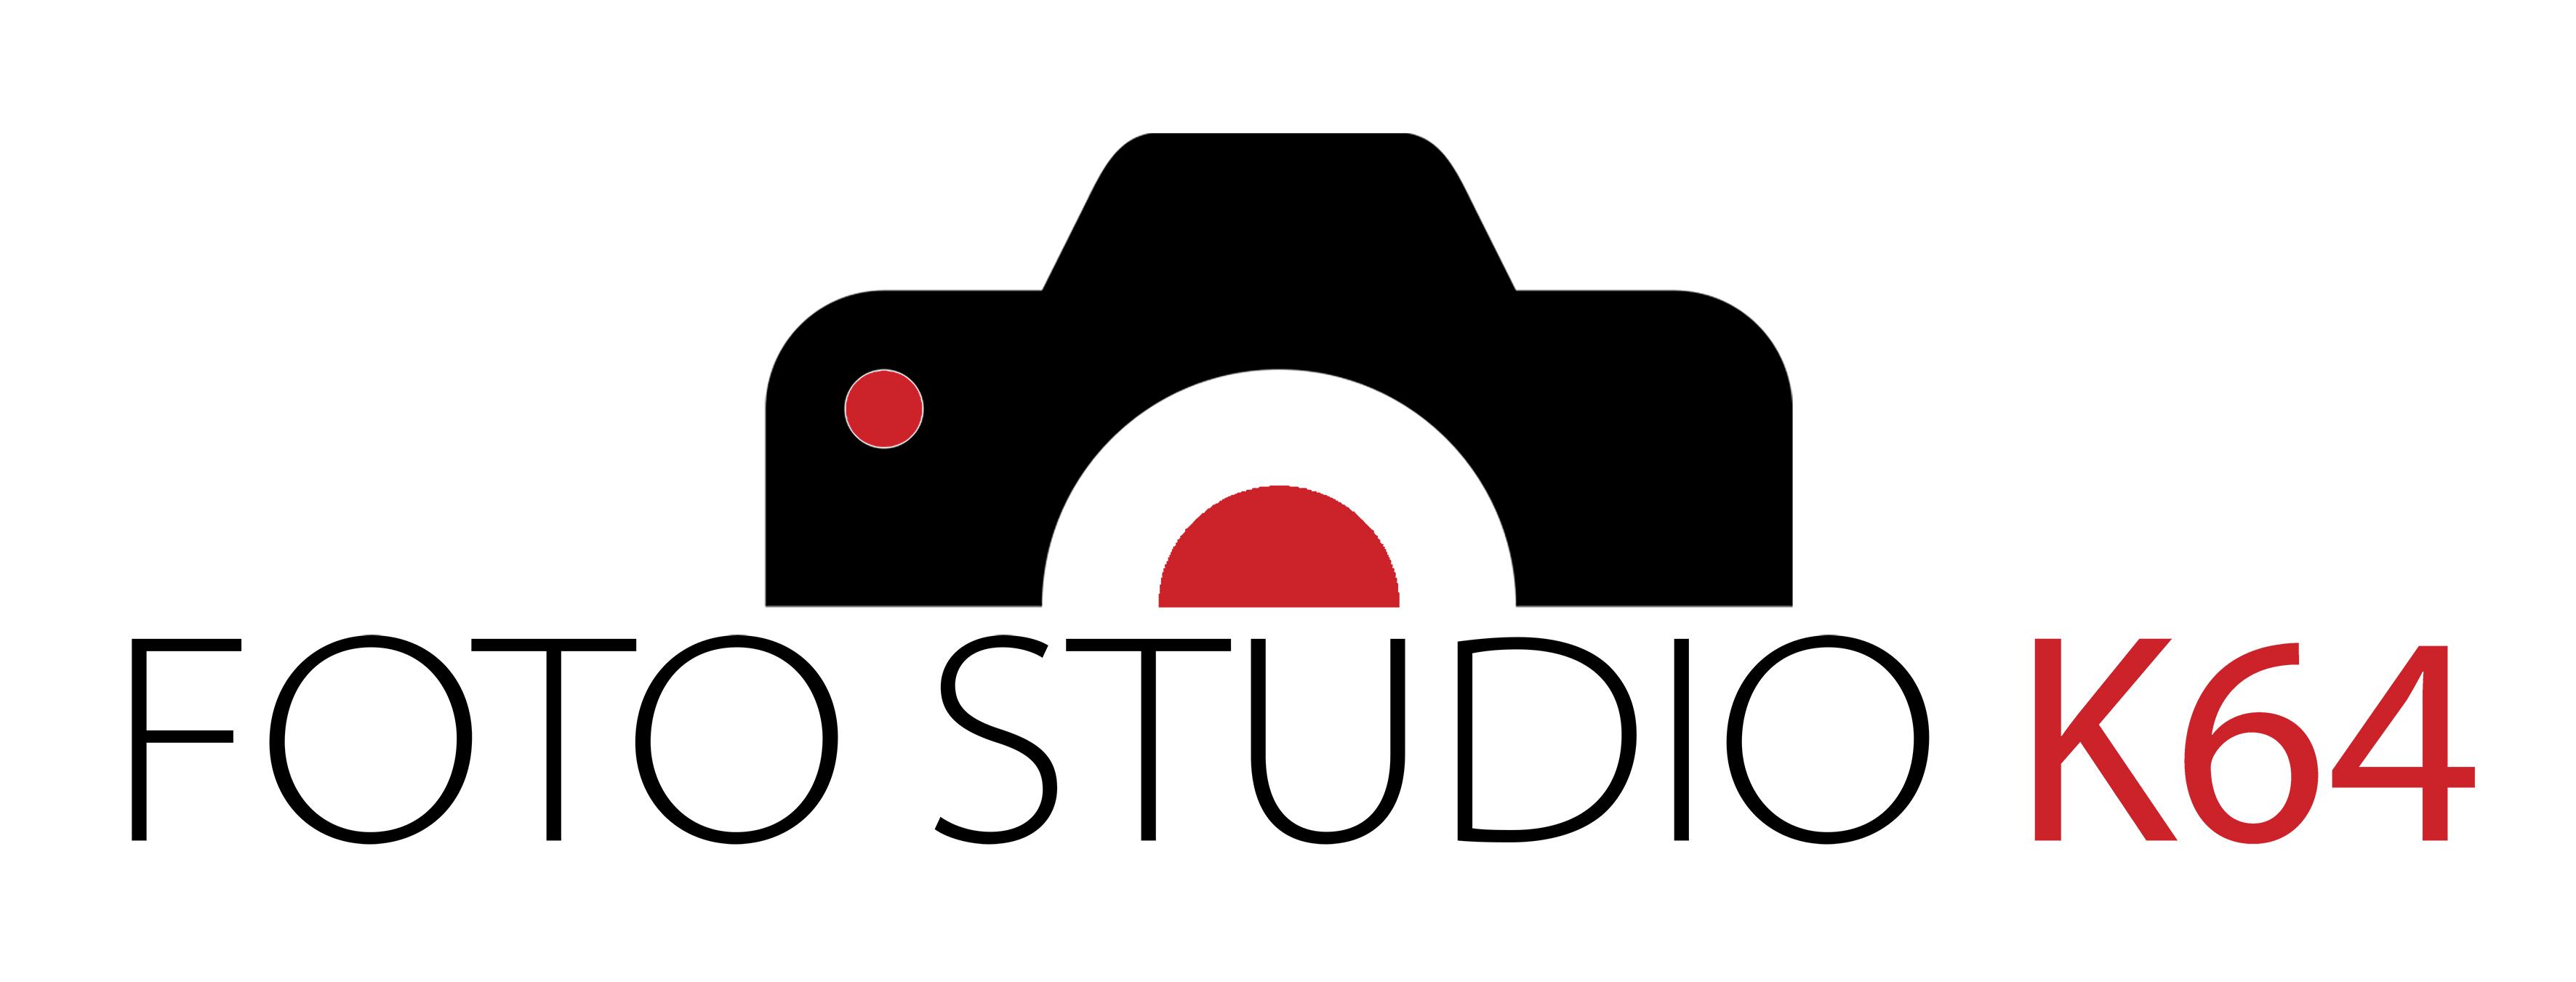 Studio Fotografico K64